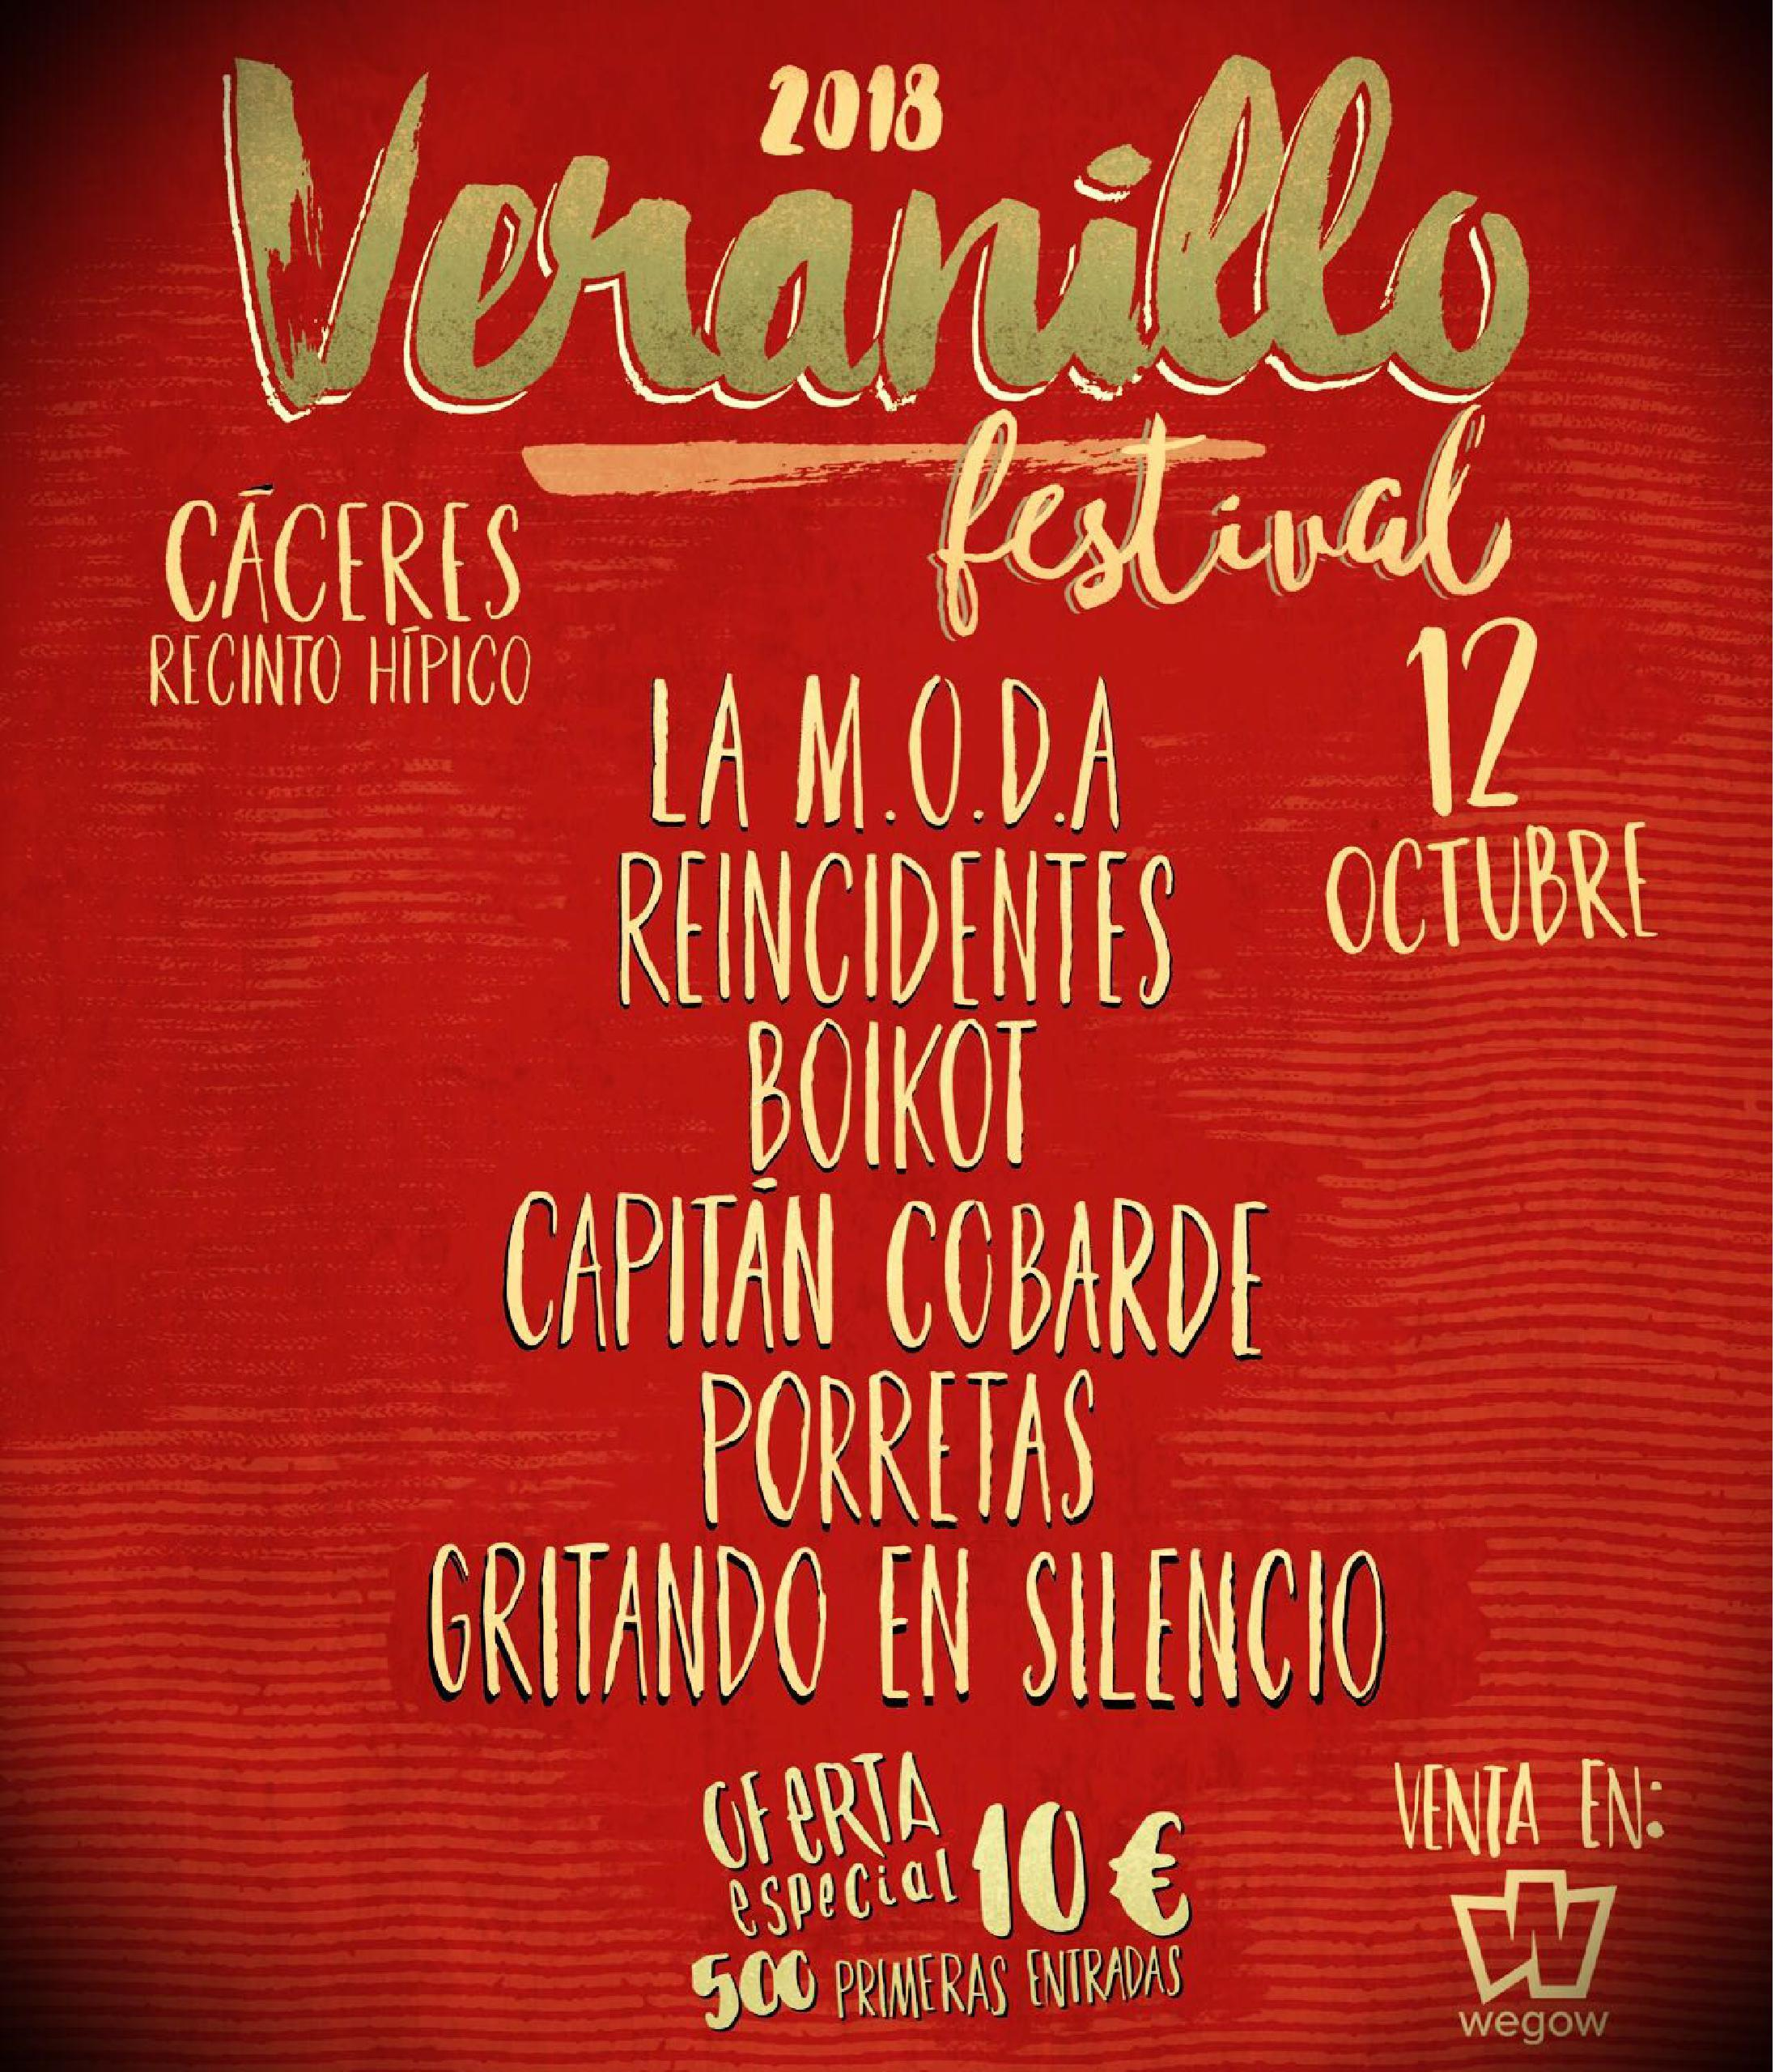 2c3f09400904 Veranillo Festival 2018. Comprar Entradas.